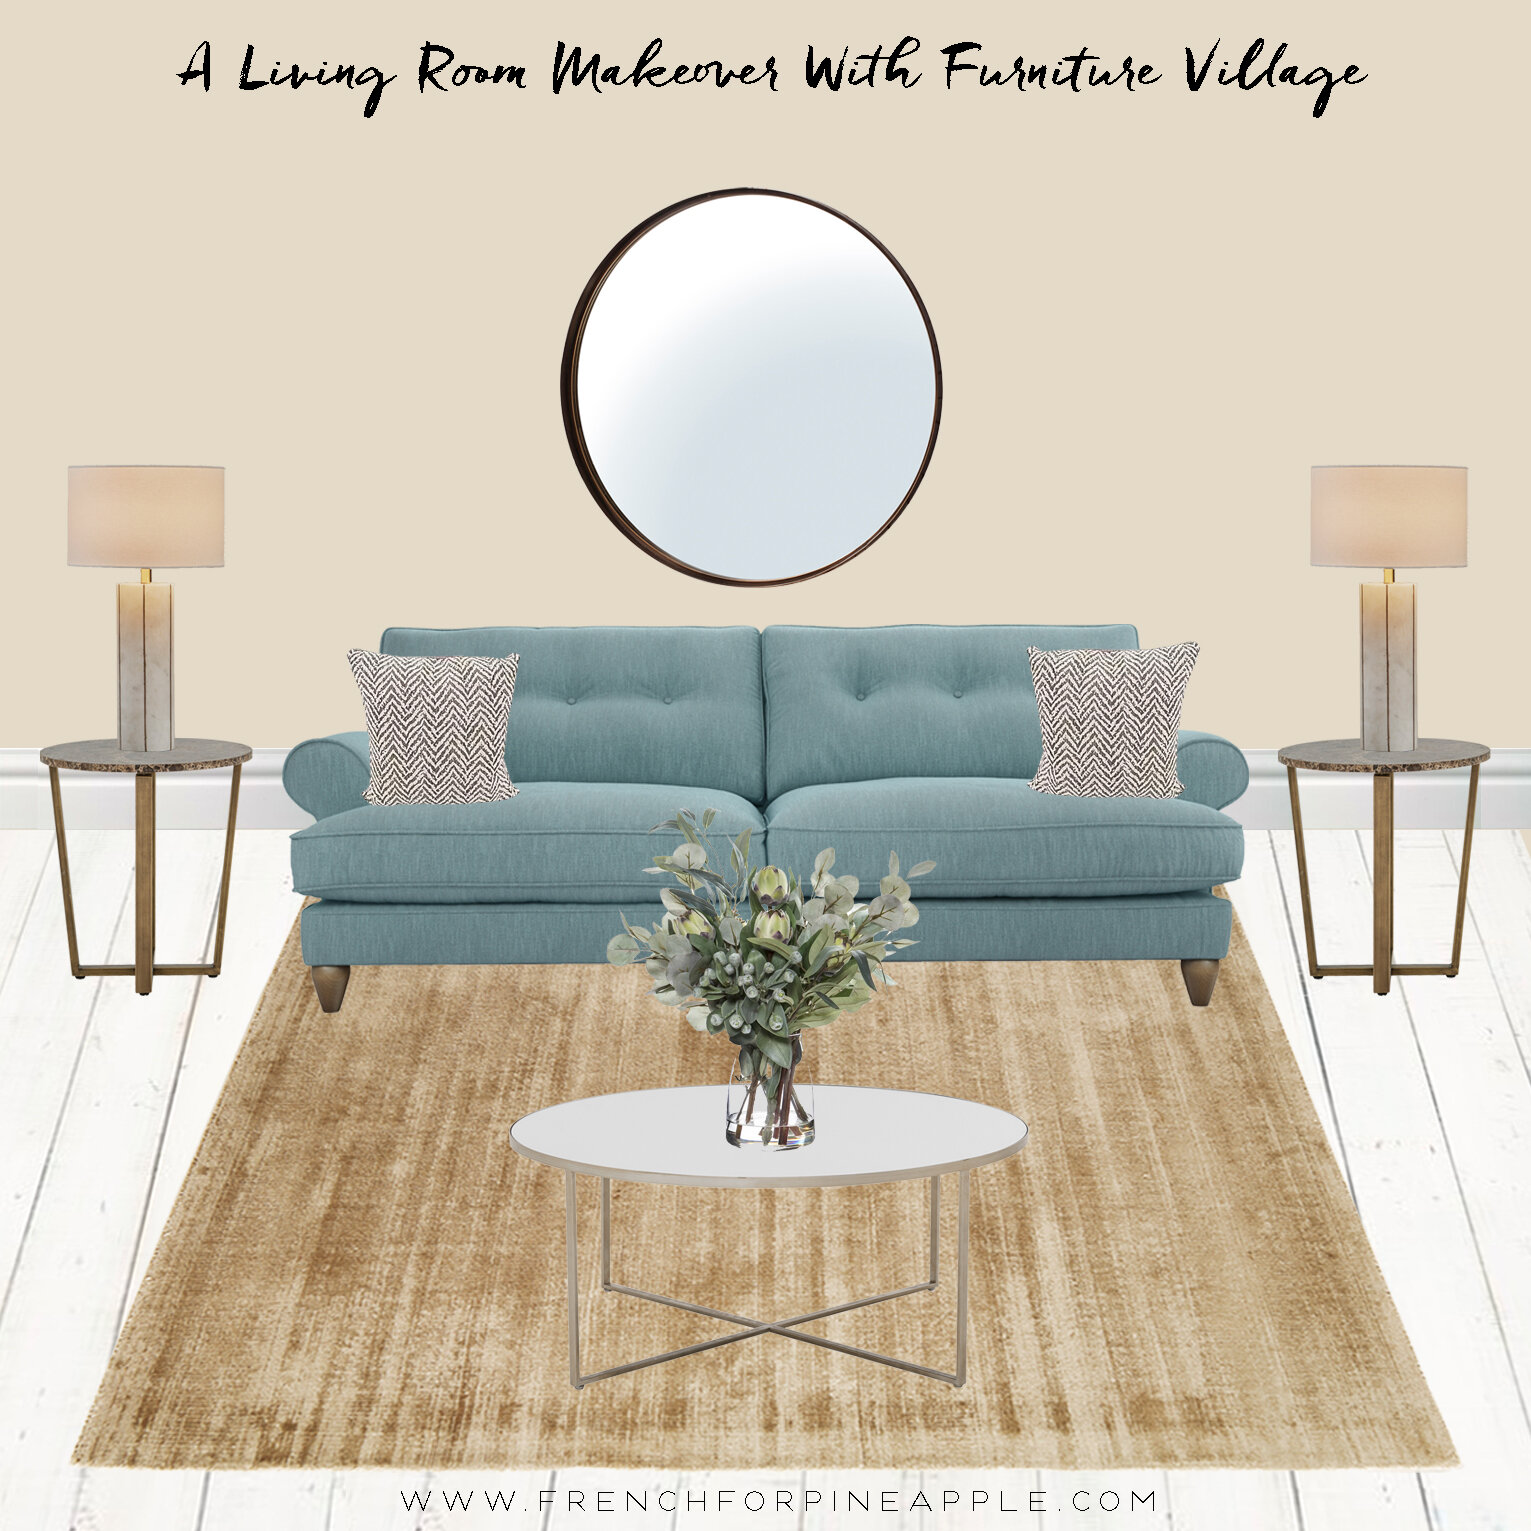 A Black Friday Living Room Makeover With Furniture Village